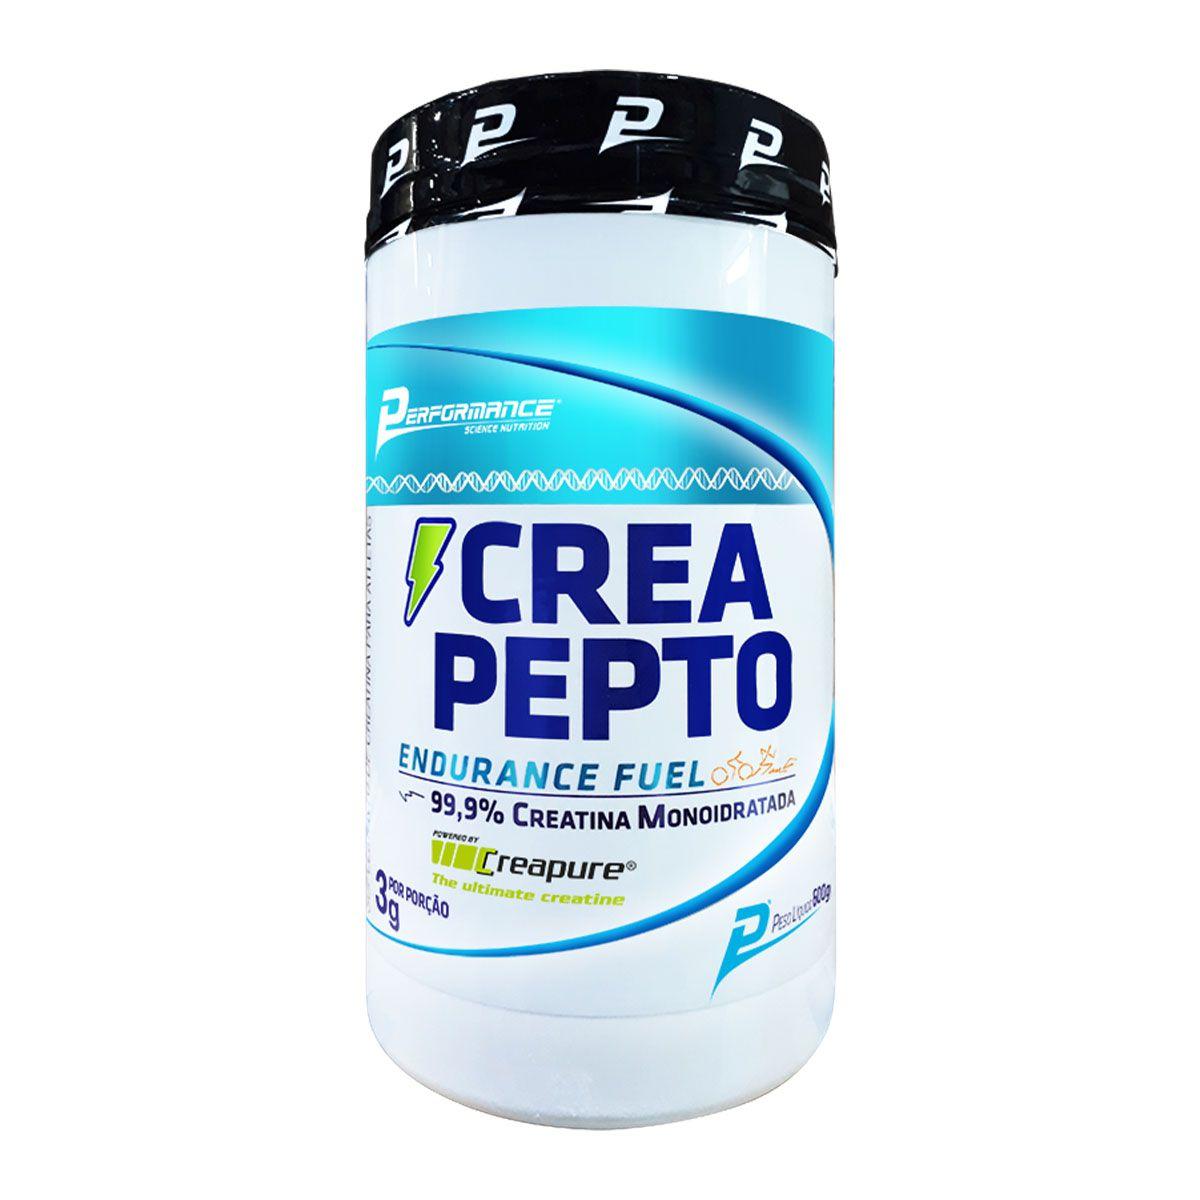 Crea Pepto Creapure 600g - Performance